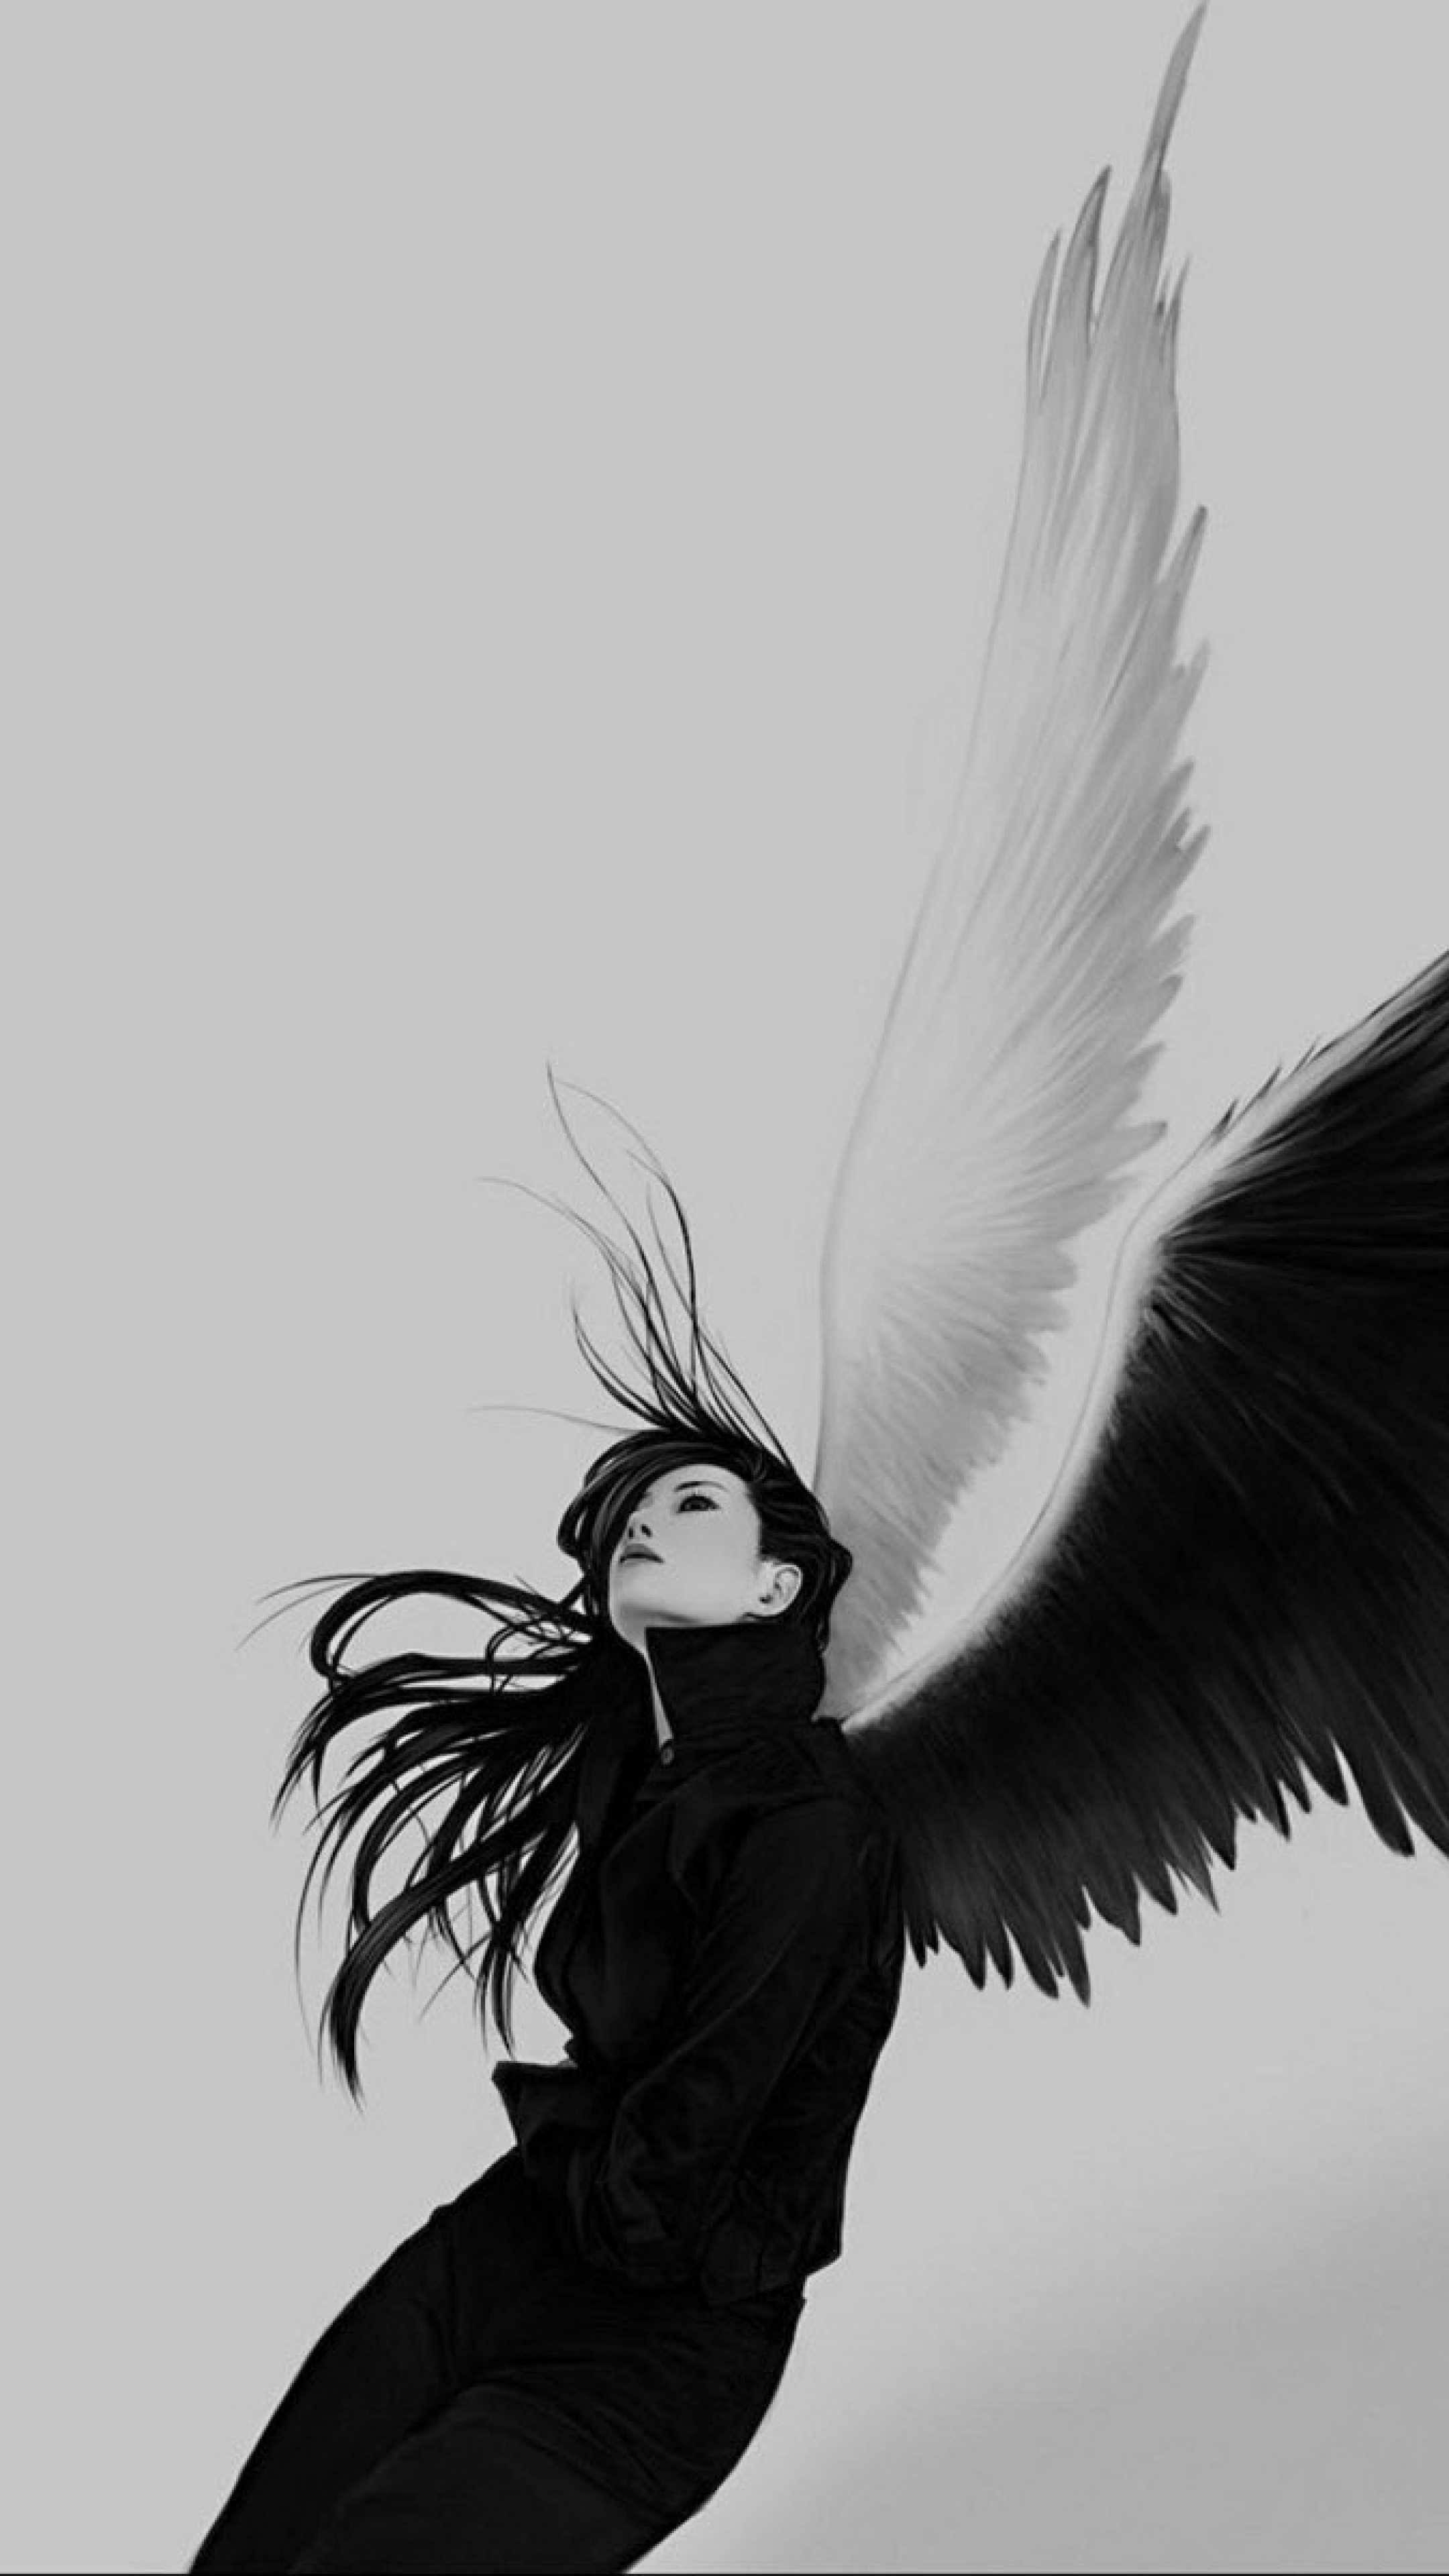 67 Angel Wings Wallpapers on WallpaperPlay 2160x3840